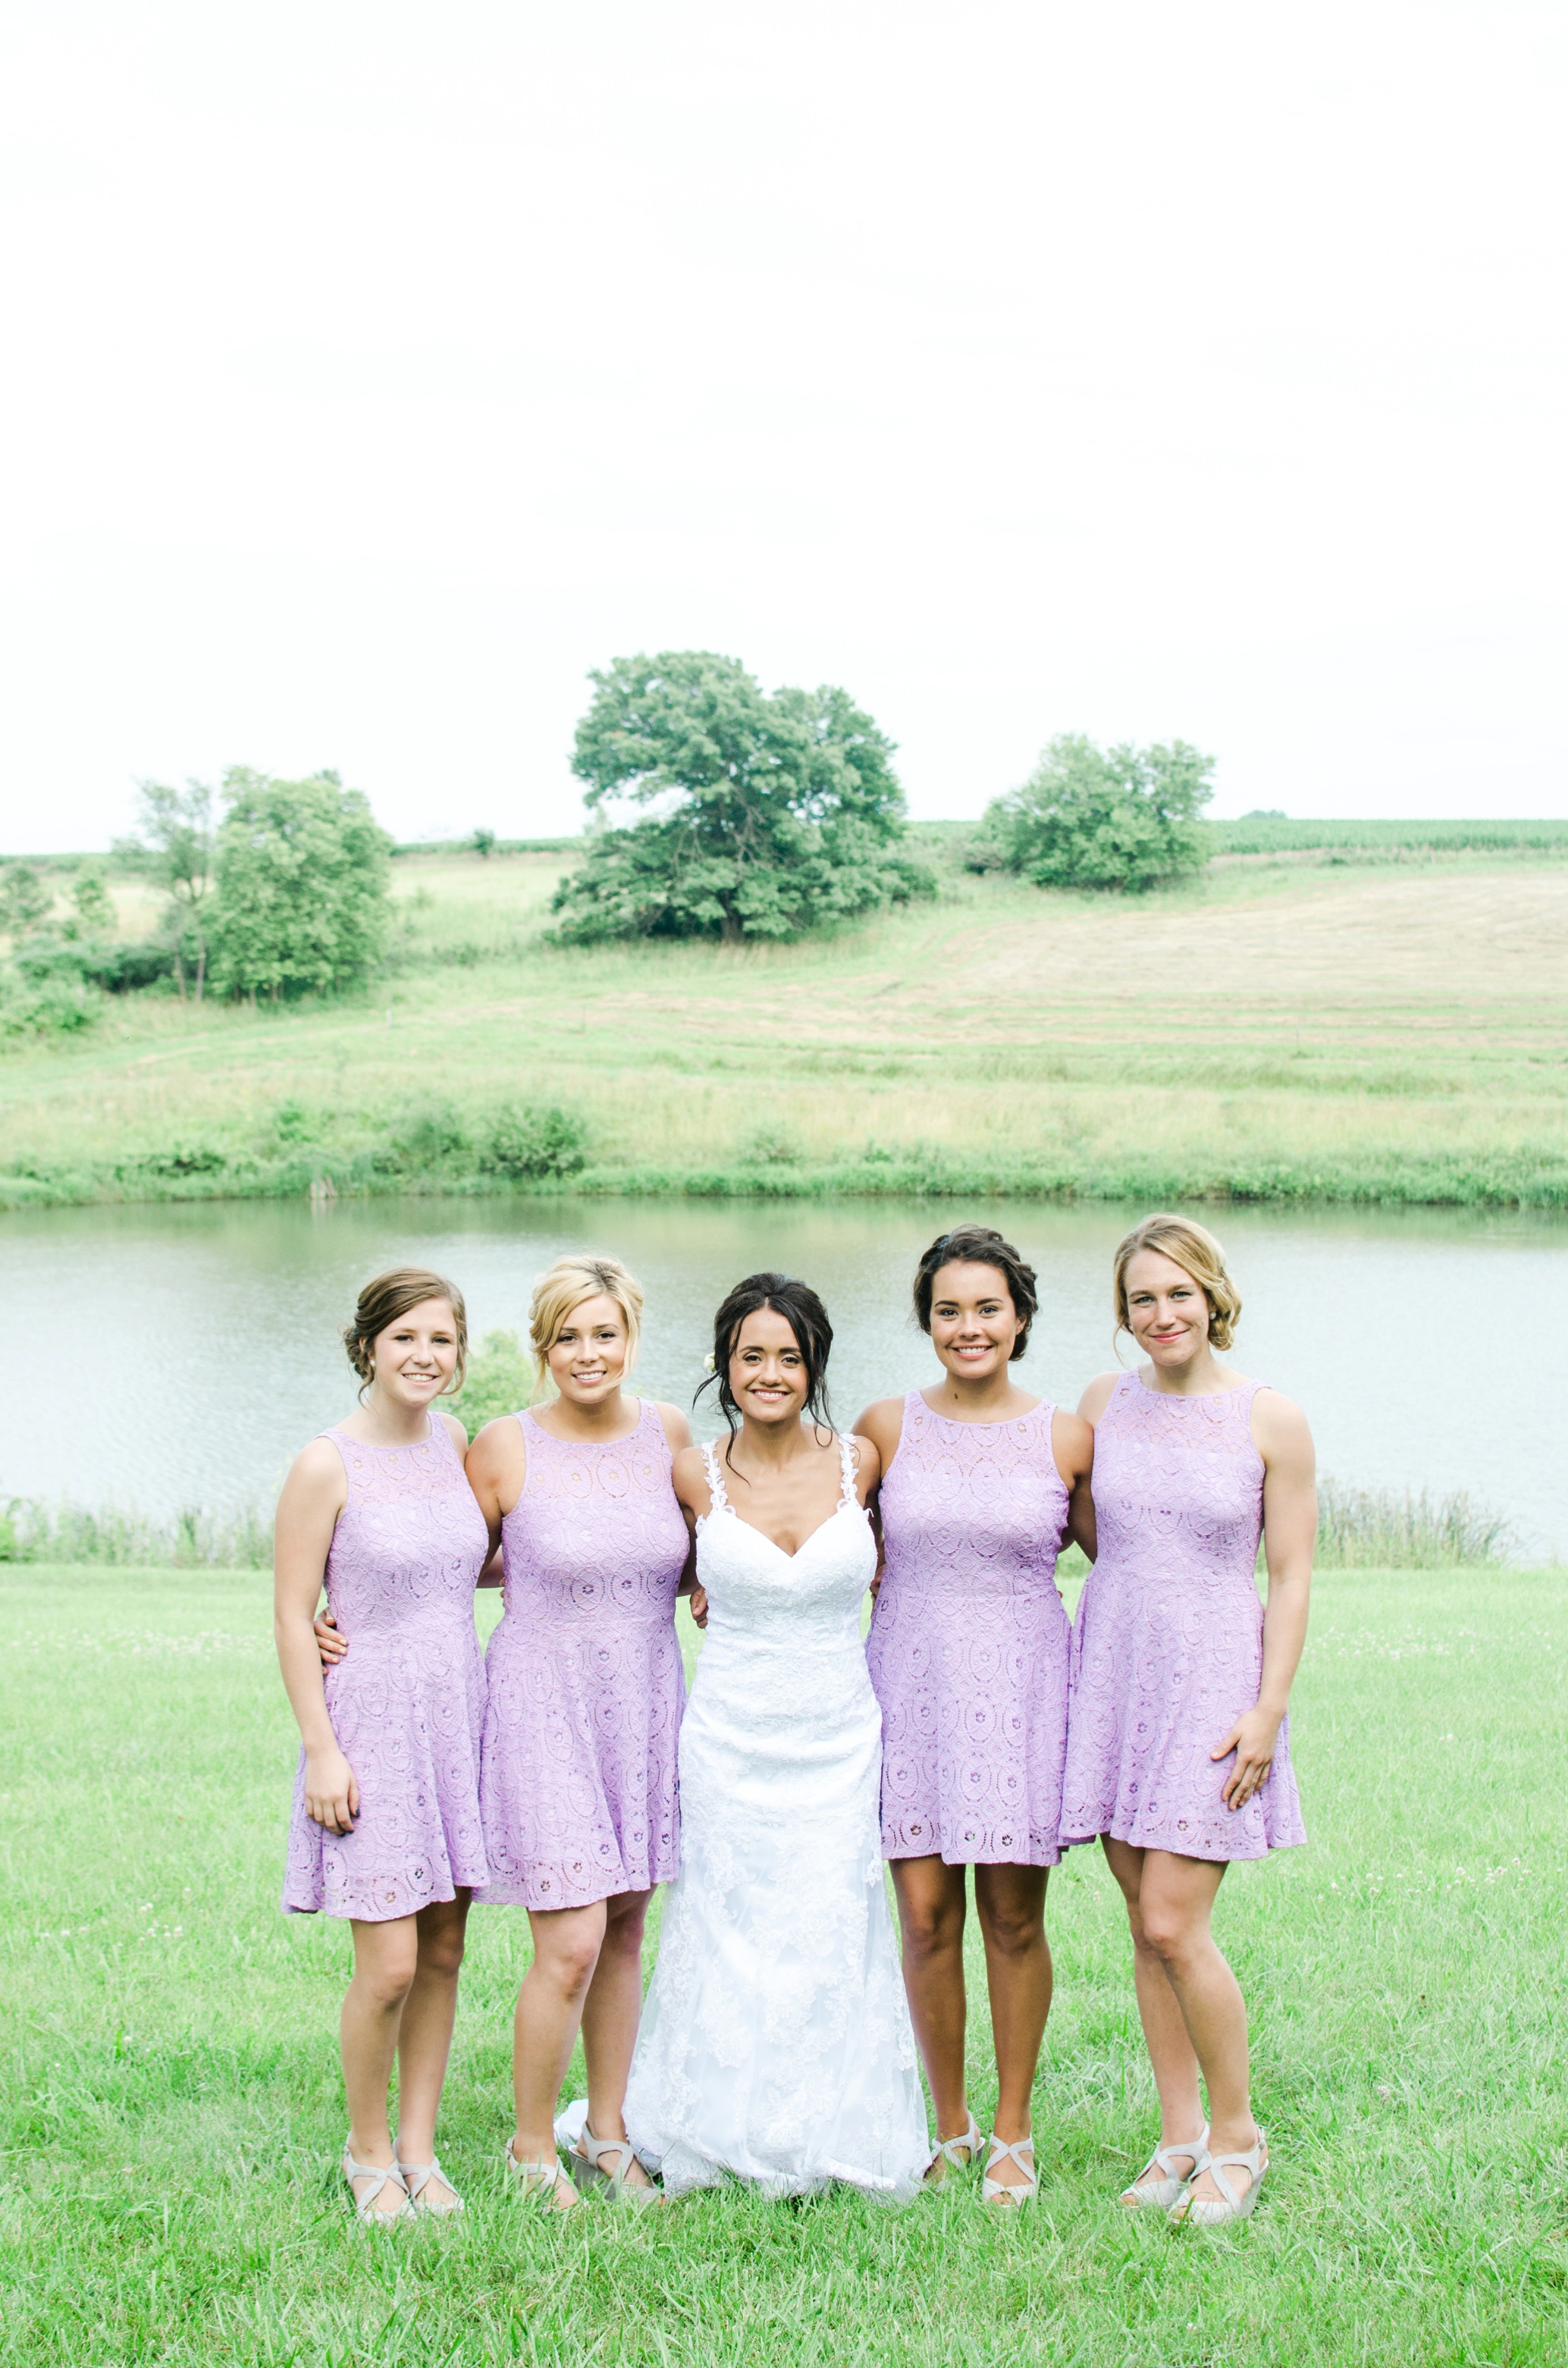 Barnes' Place Rustic Outdoor Wedding | Ali Leigh Photo Minneapolis Wedding Photographer_0143.jpg